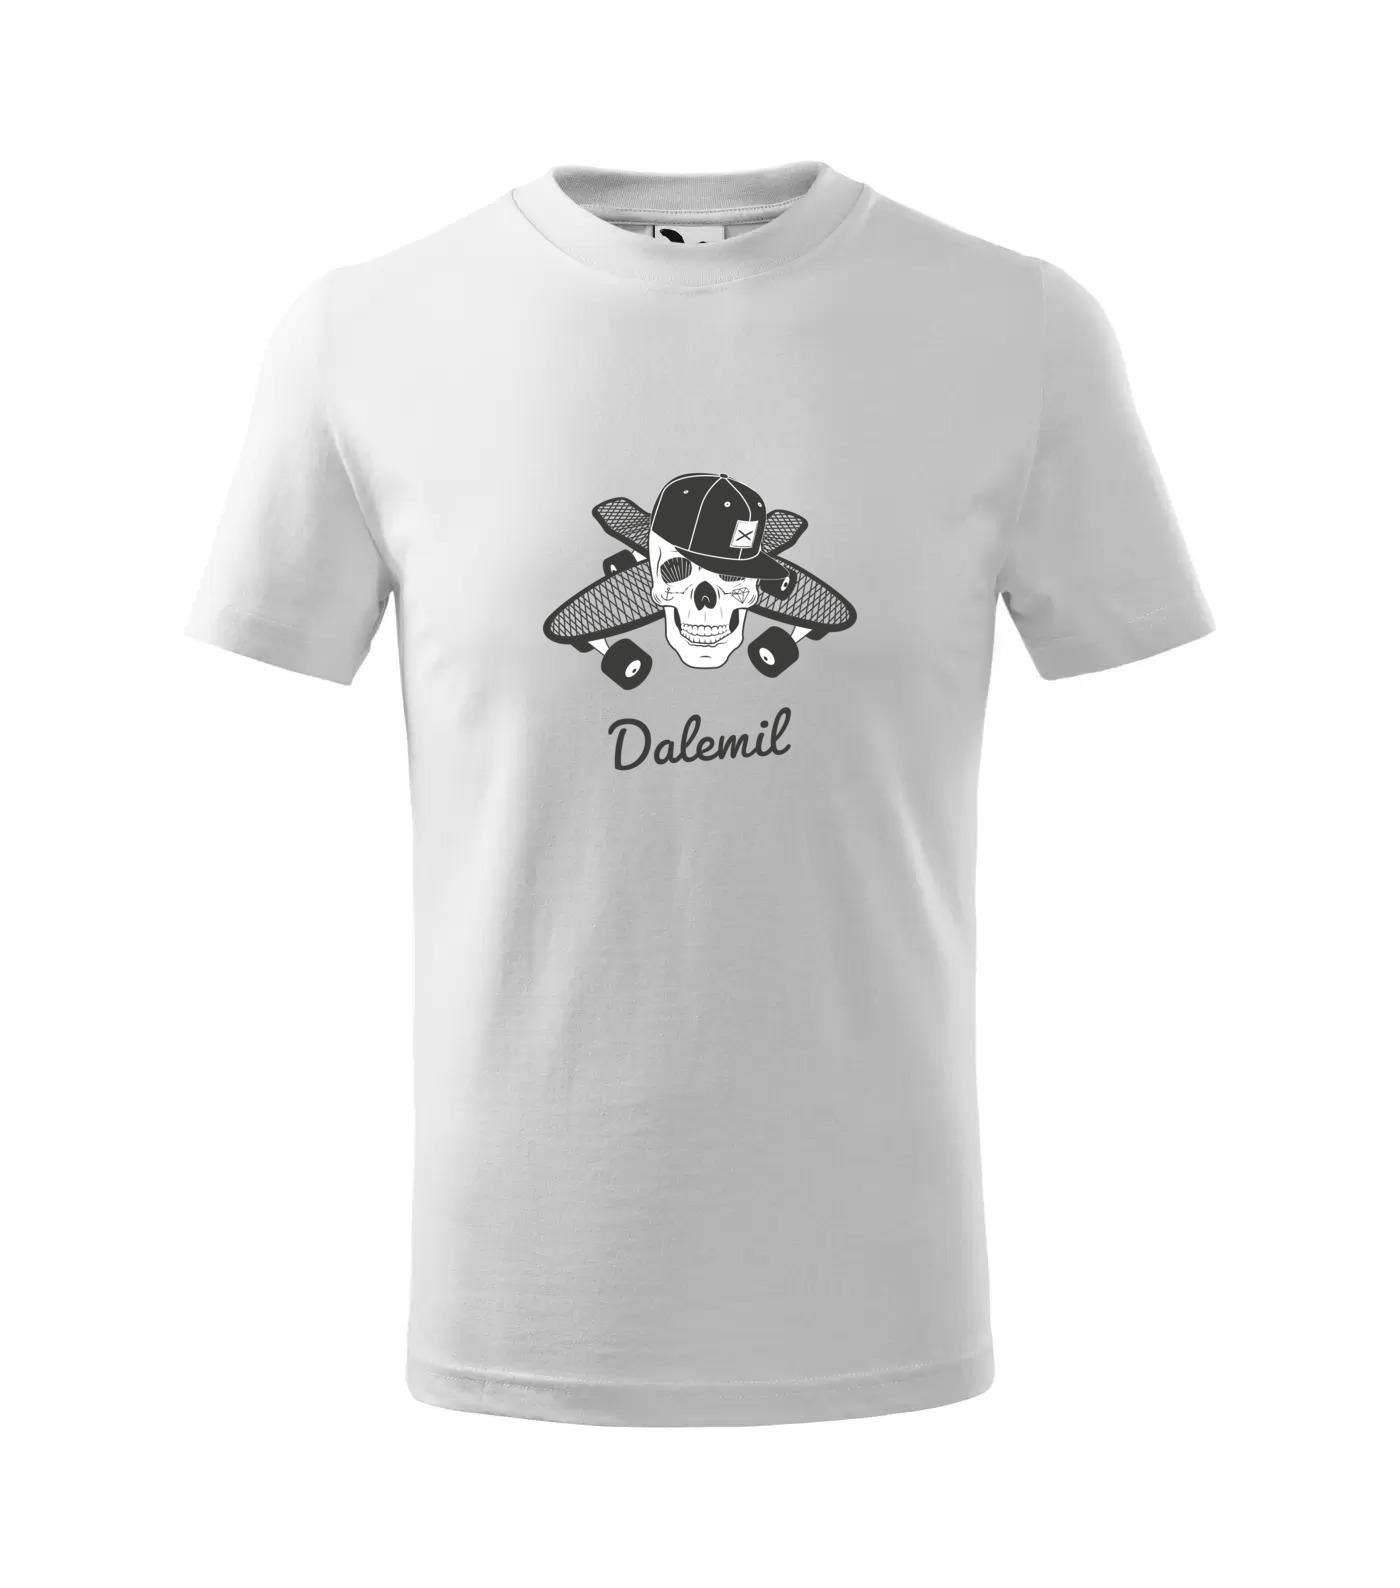 Tričko Skejťák Dalemil